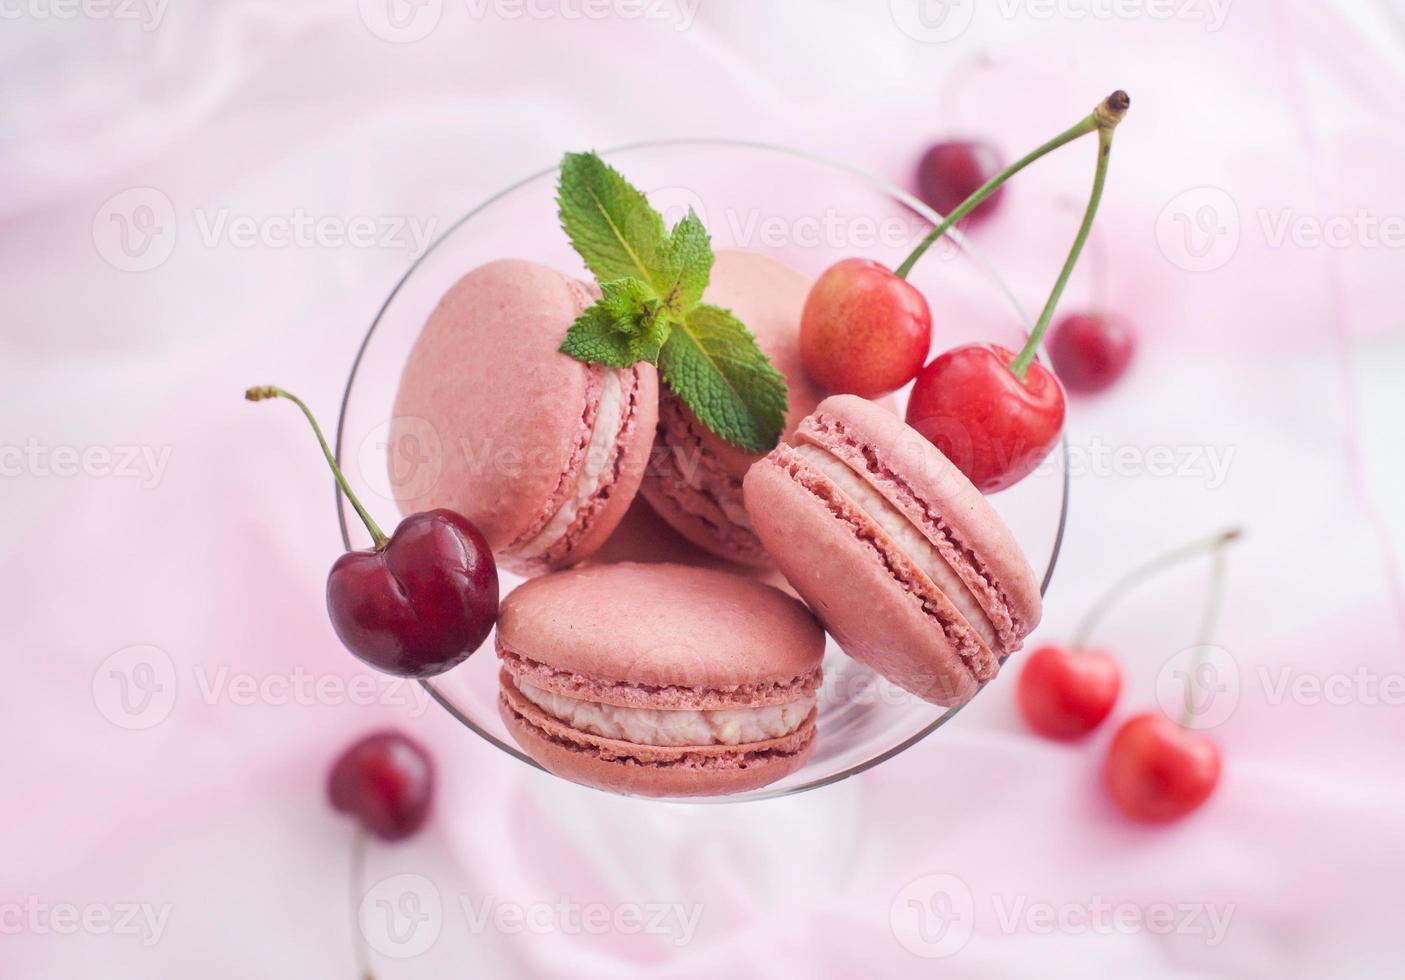 macarons franceses rosados con cereza foto